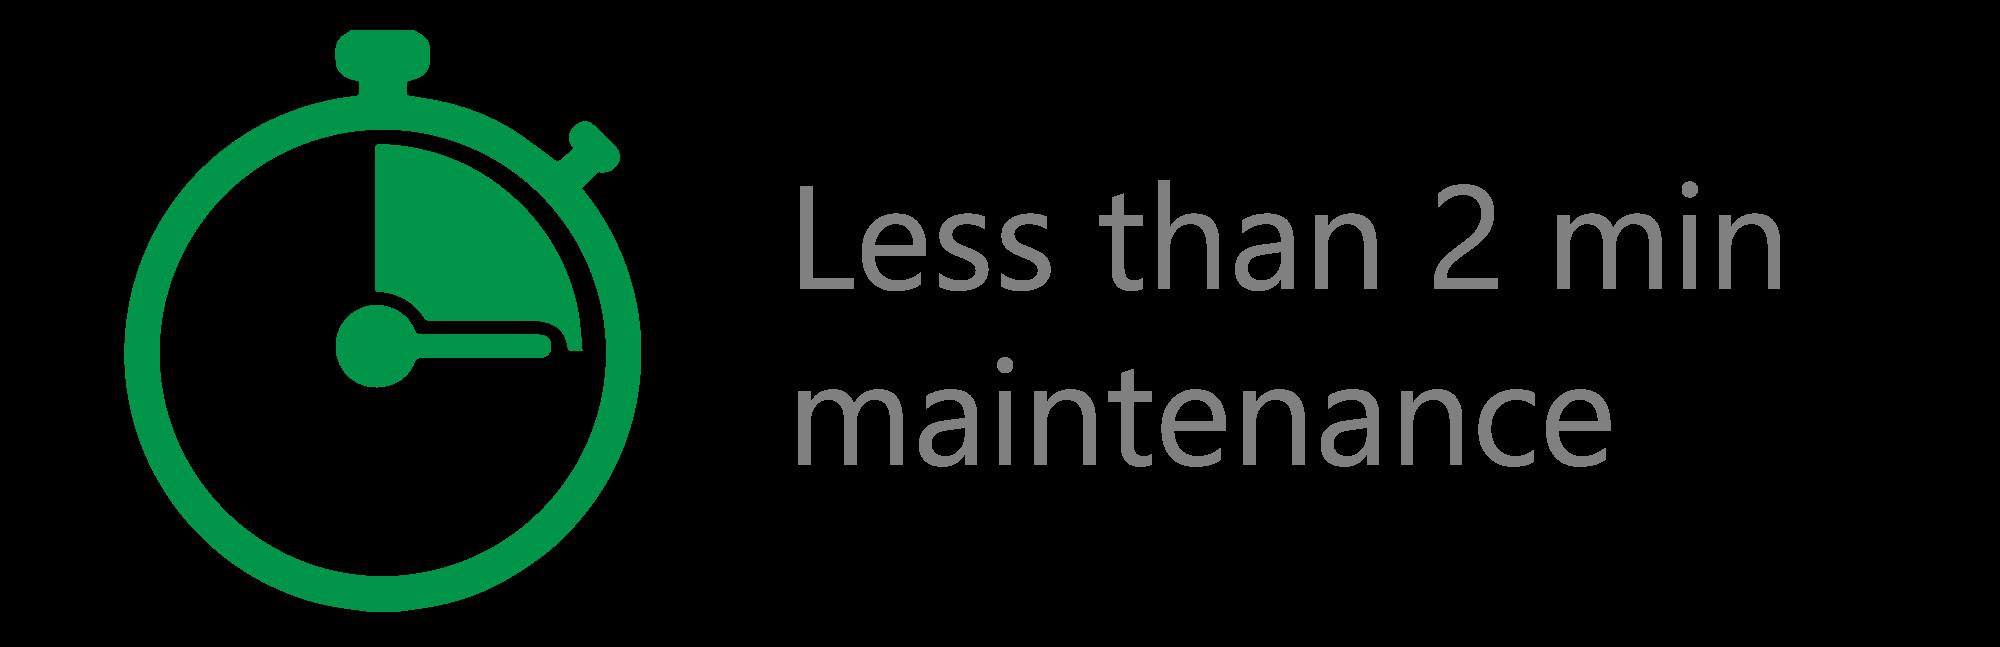 less2min-01.png